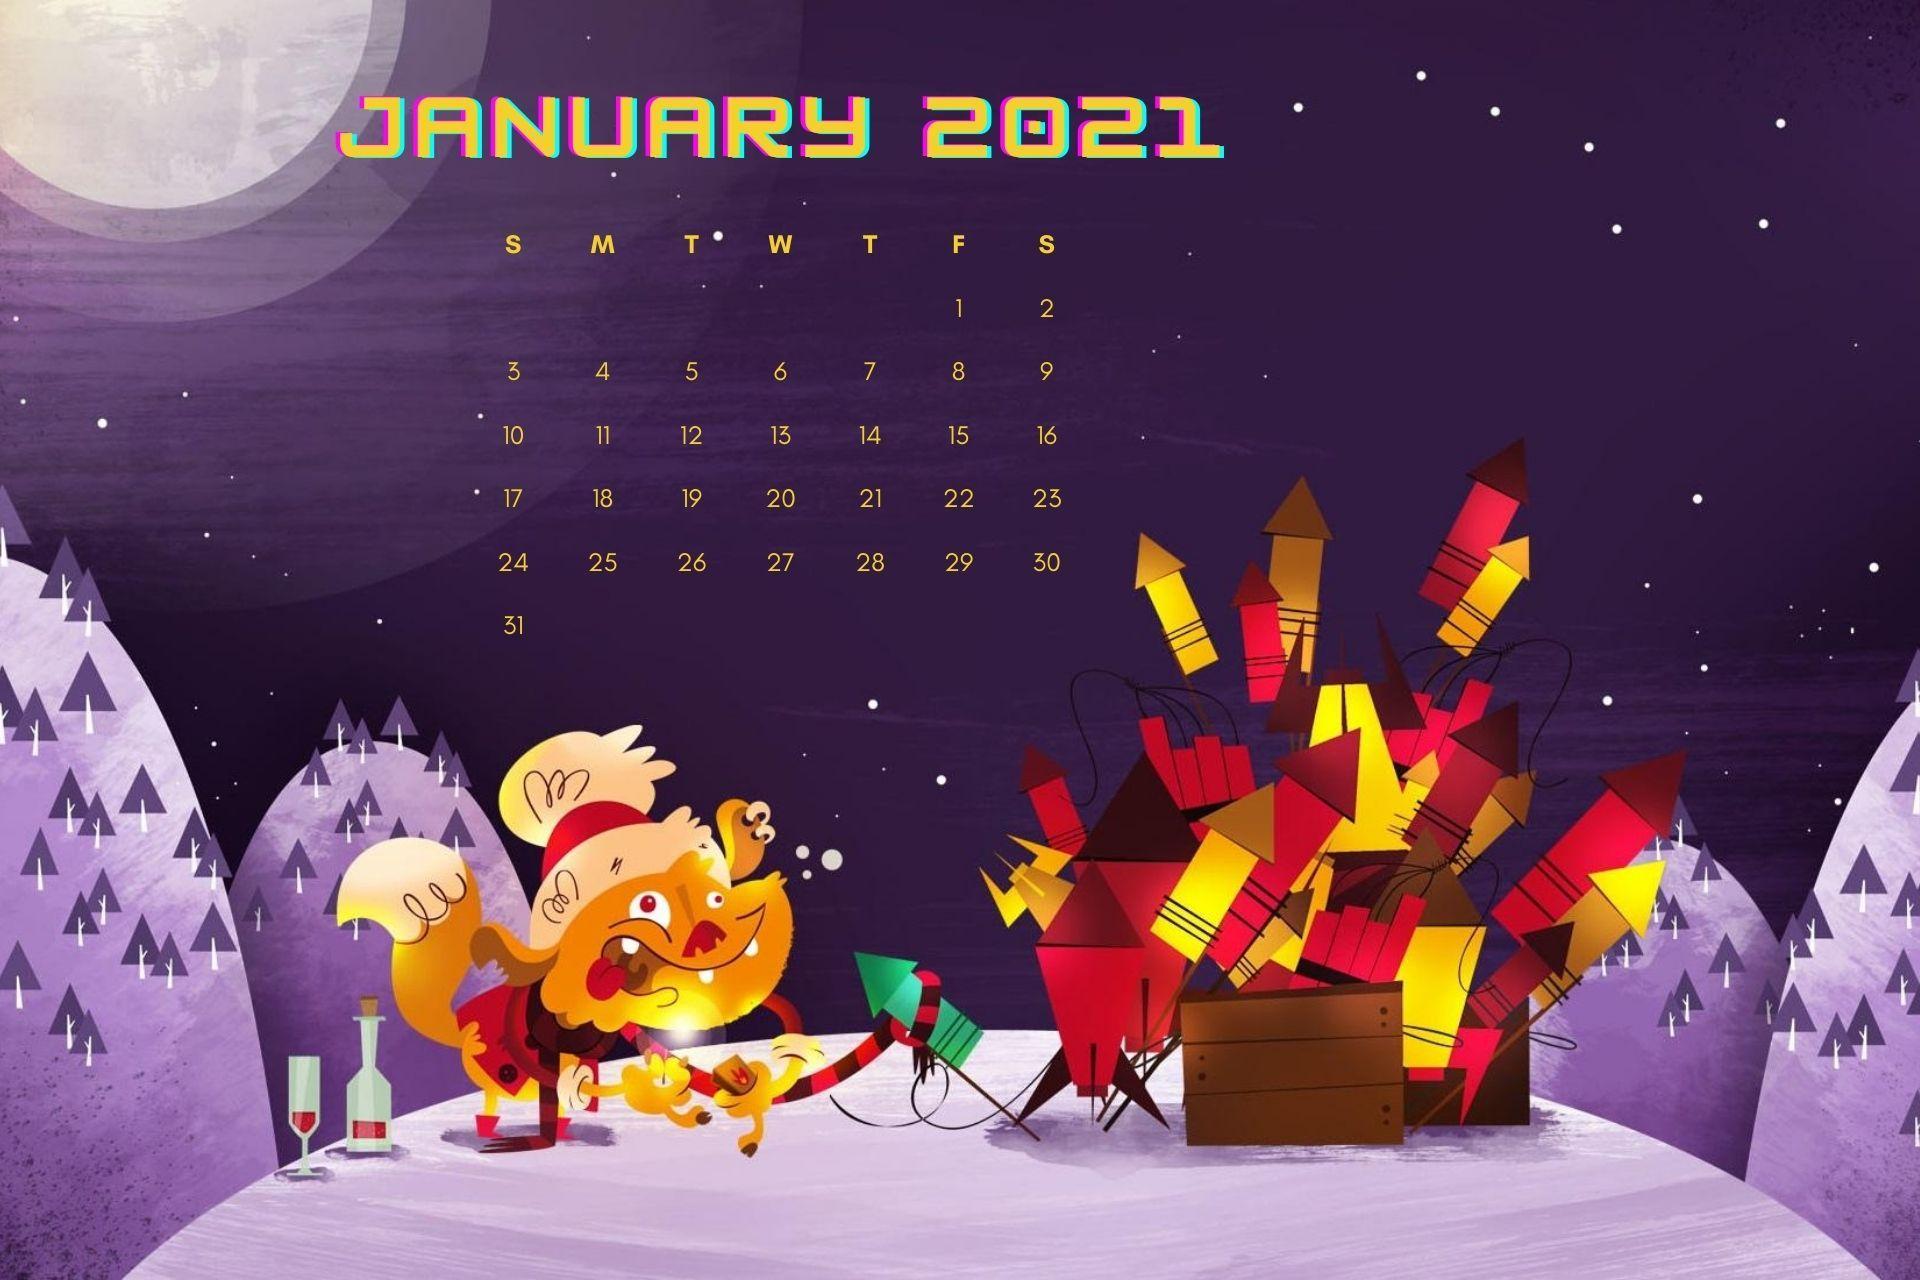 Beautiful January 2021 Calendar Wallpaper for desktop Calendar 1920x1280